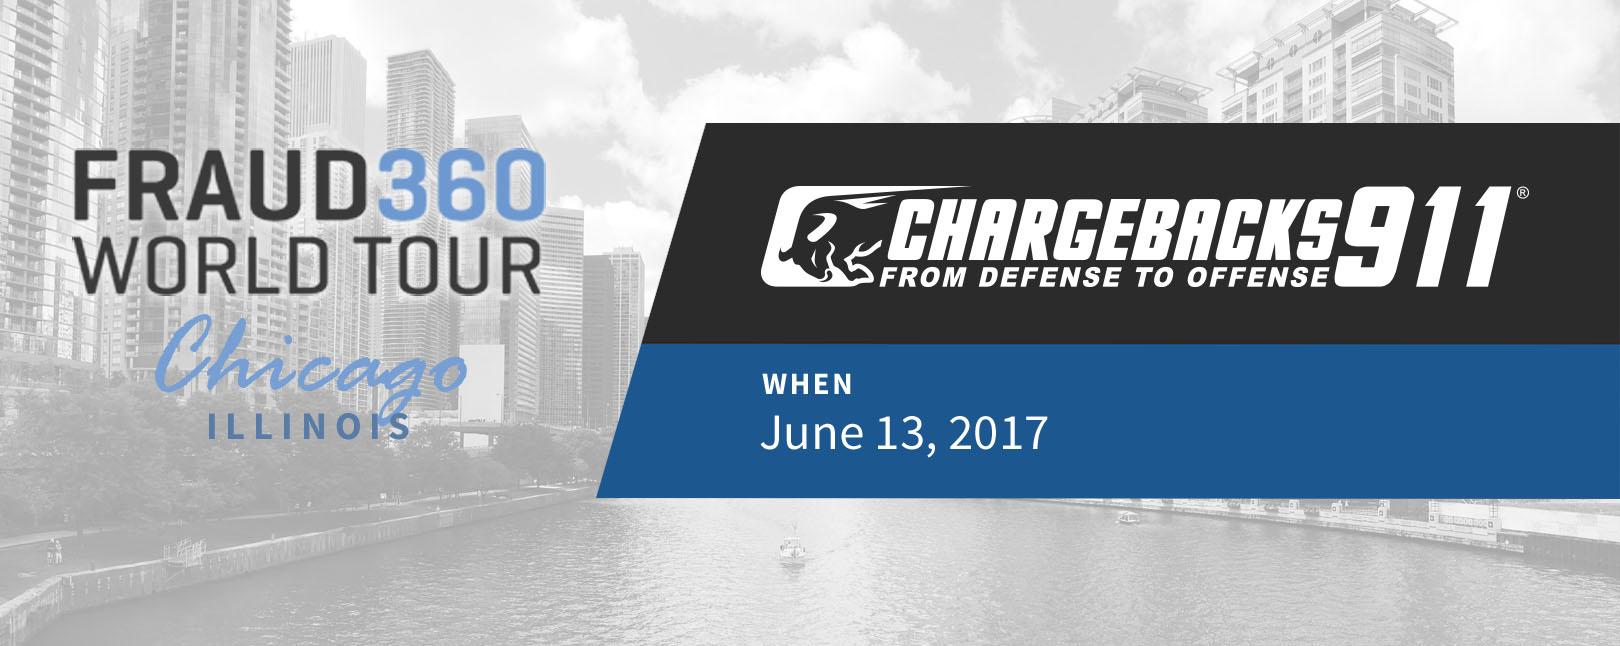 Chargebacks911 at Fraud360 World Tour - Chicago